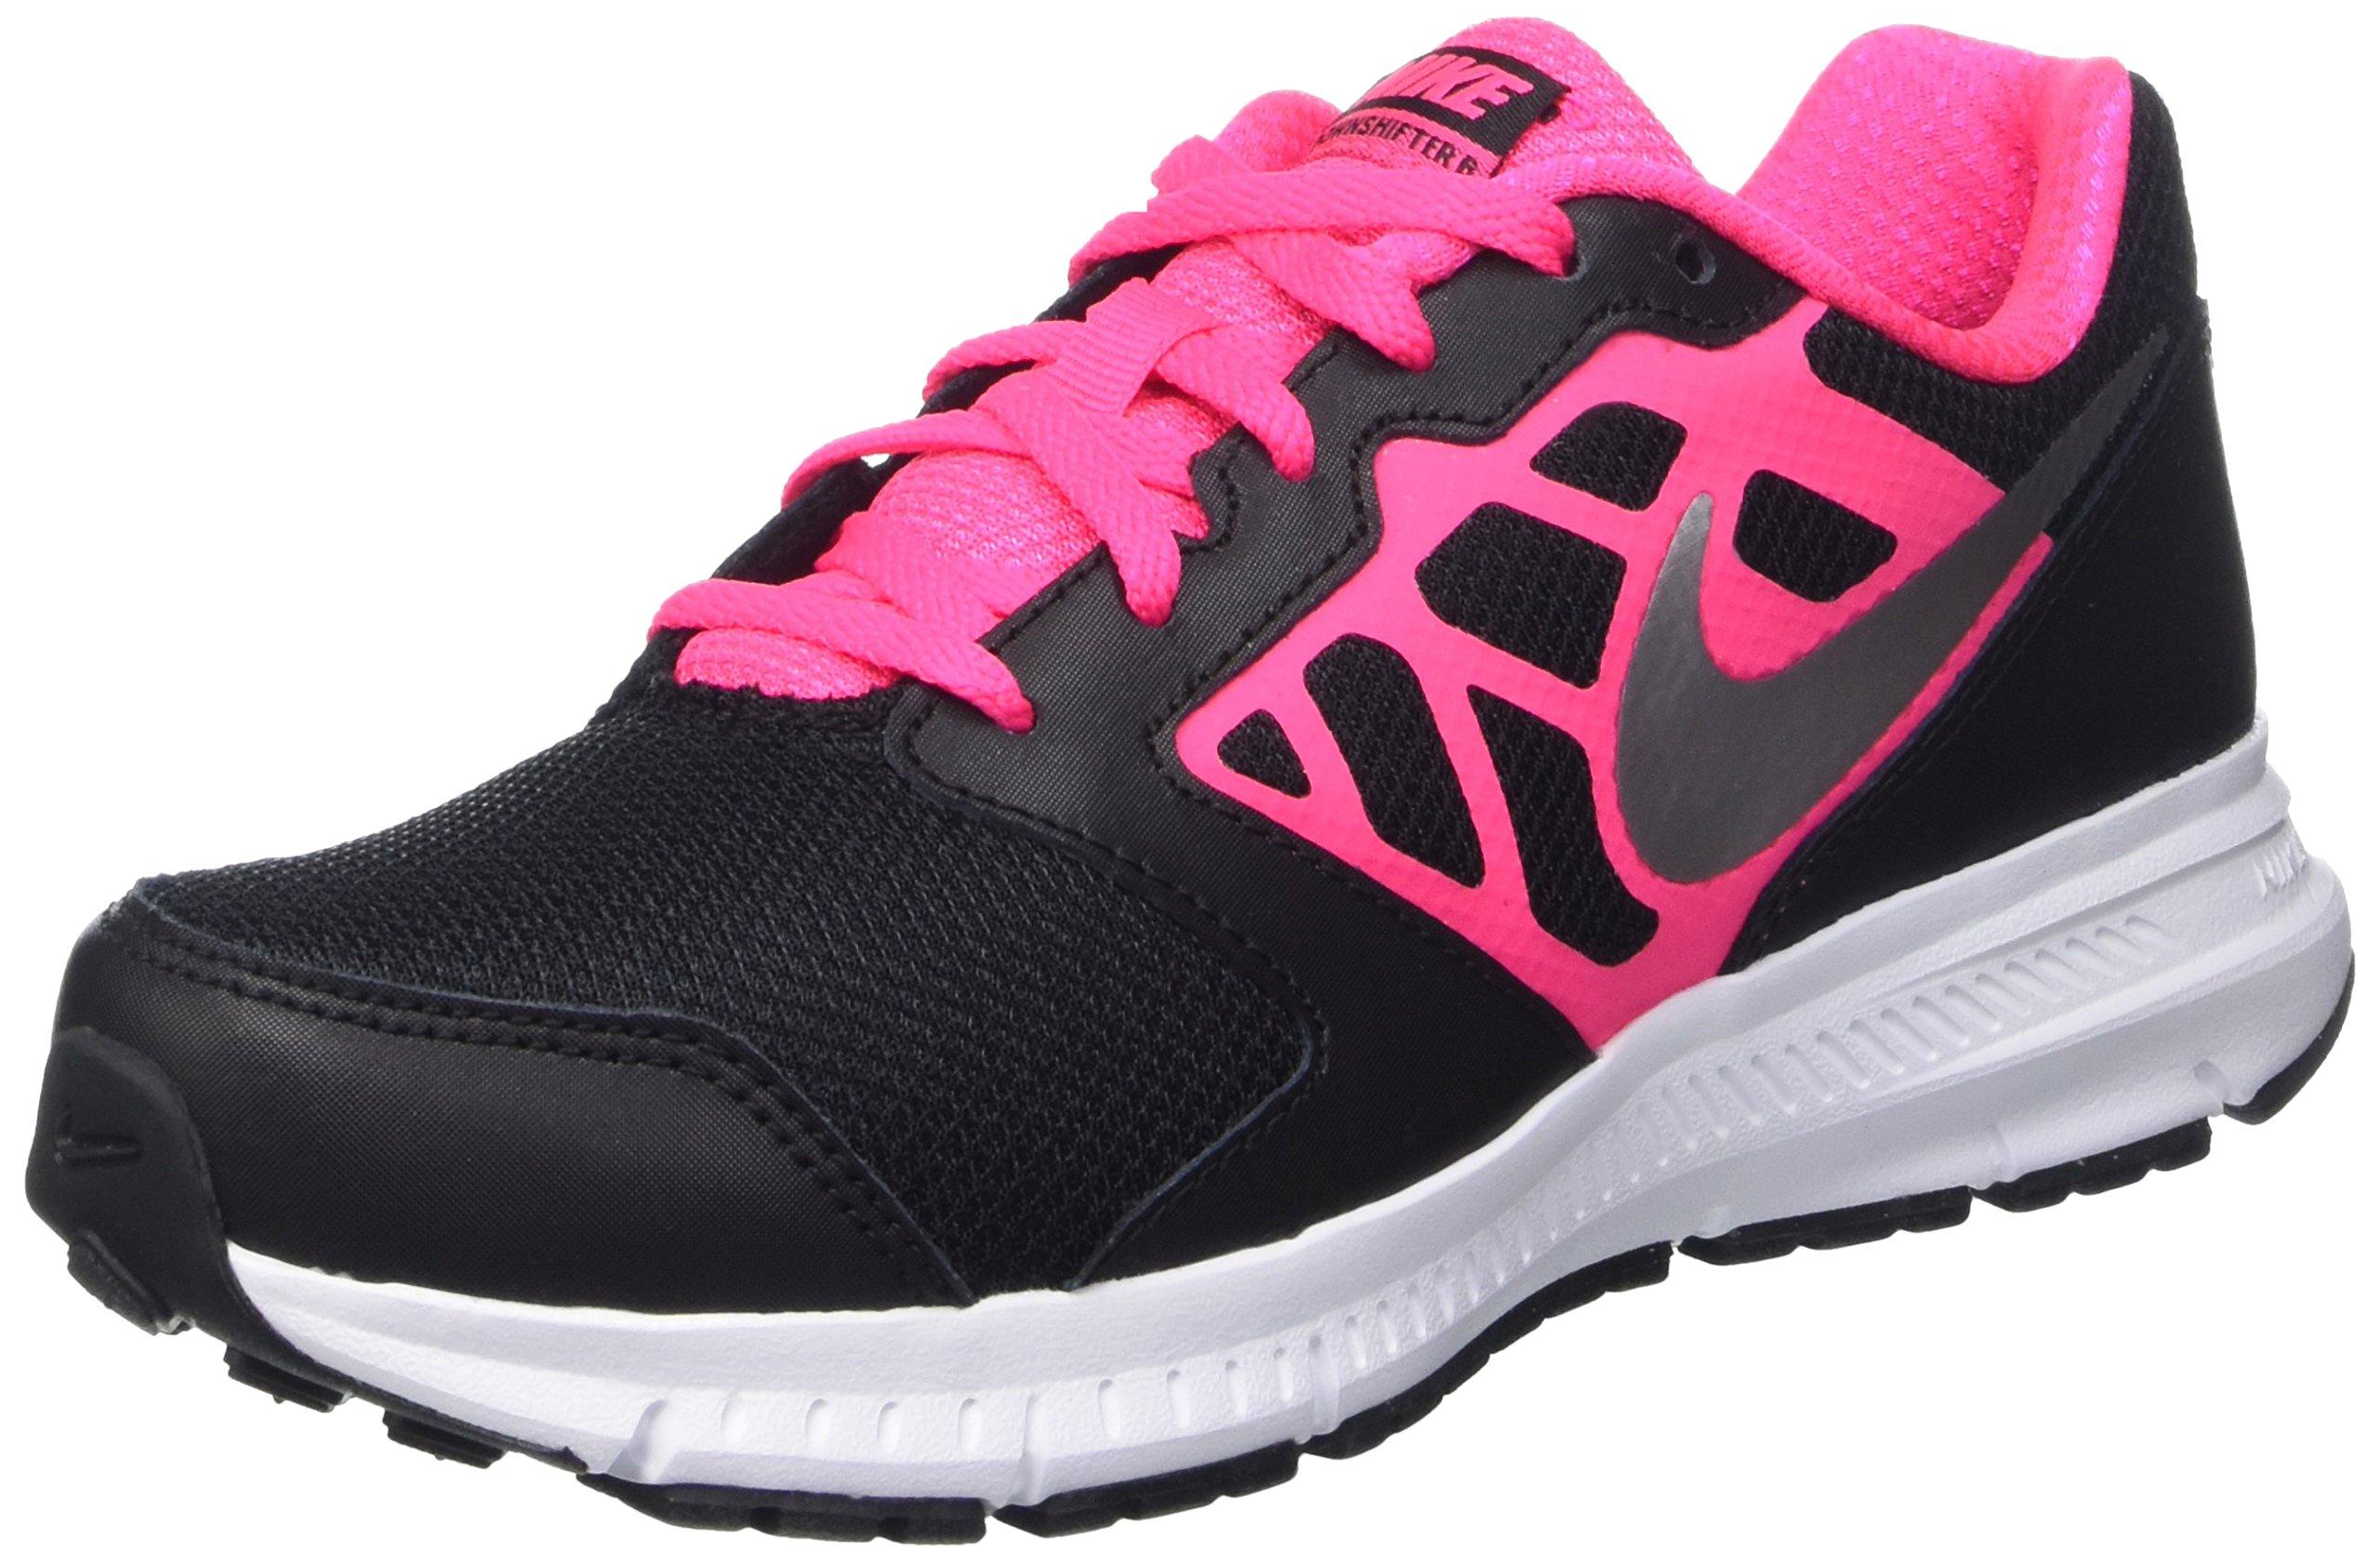 Nike Kids Downshifter 6 (Gs/Ps) Blk/Mtllc Slvr/Hypr Pnk/White Running Shoe 4 Kids US